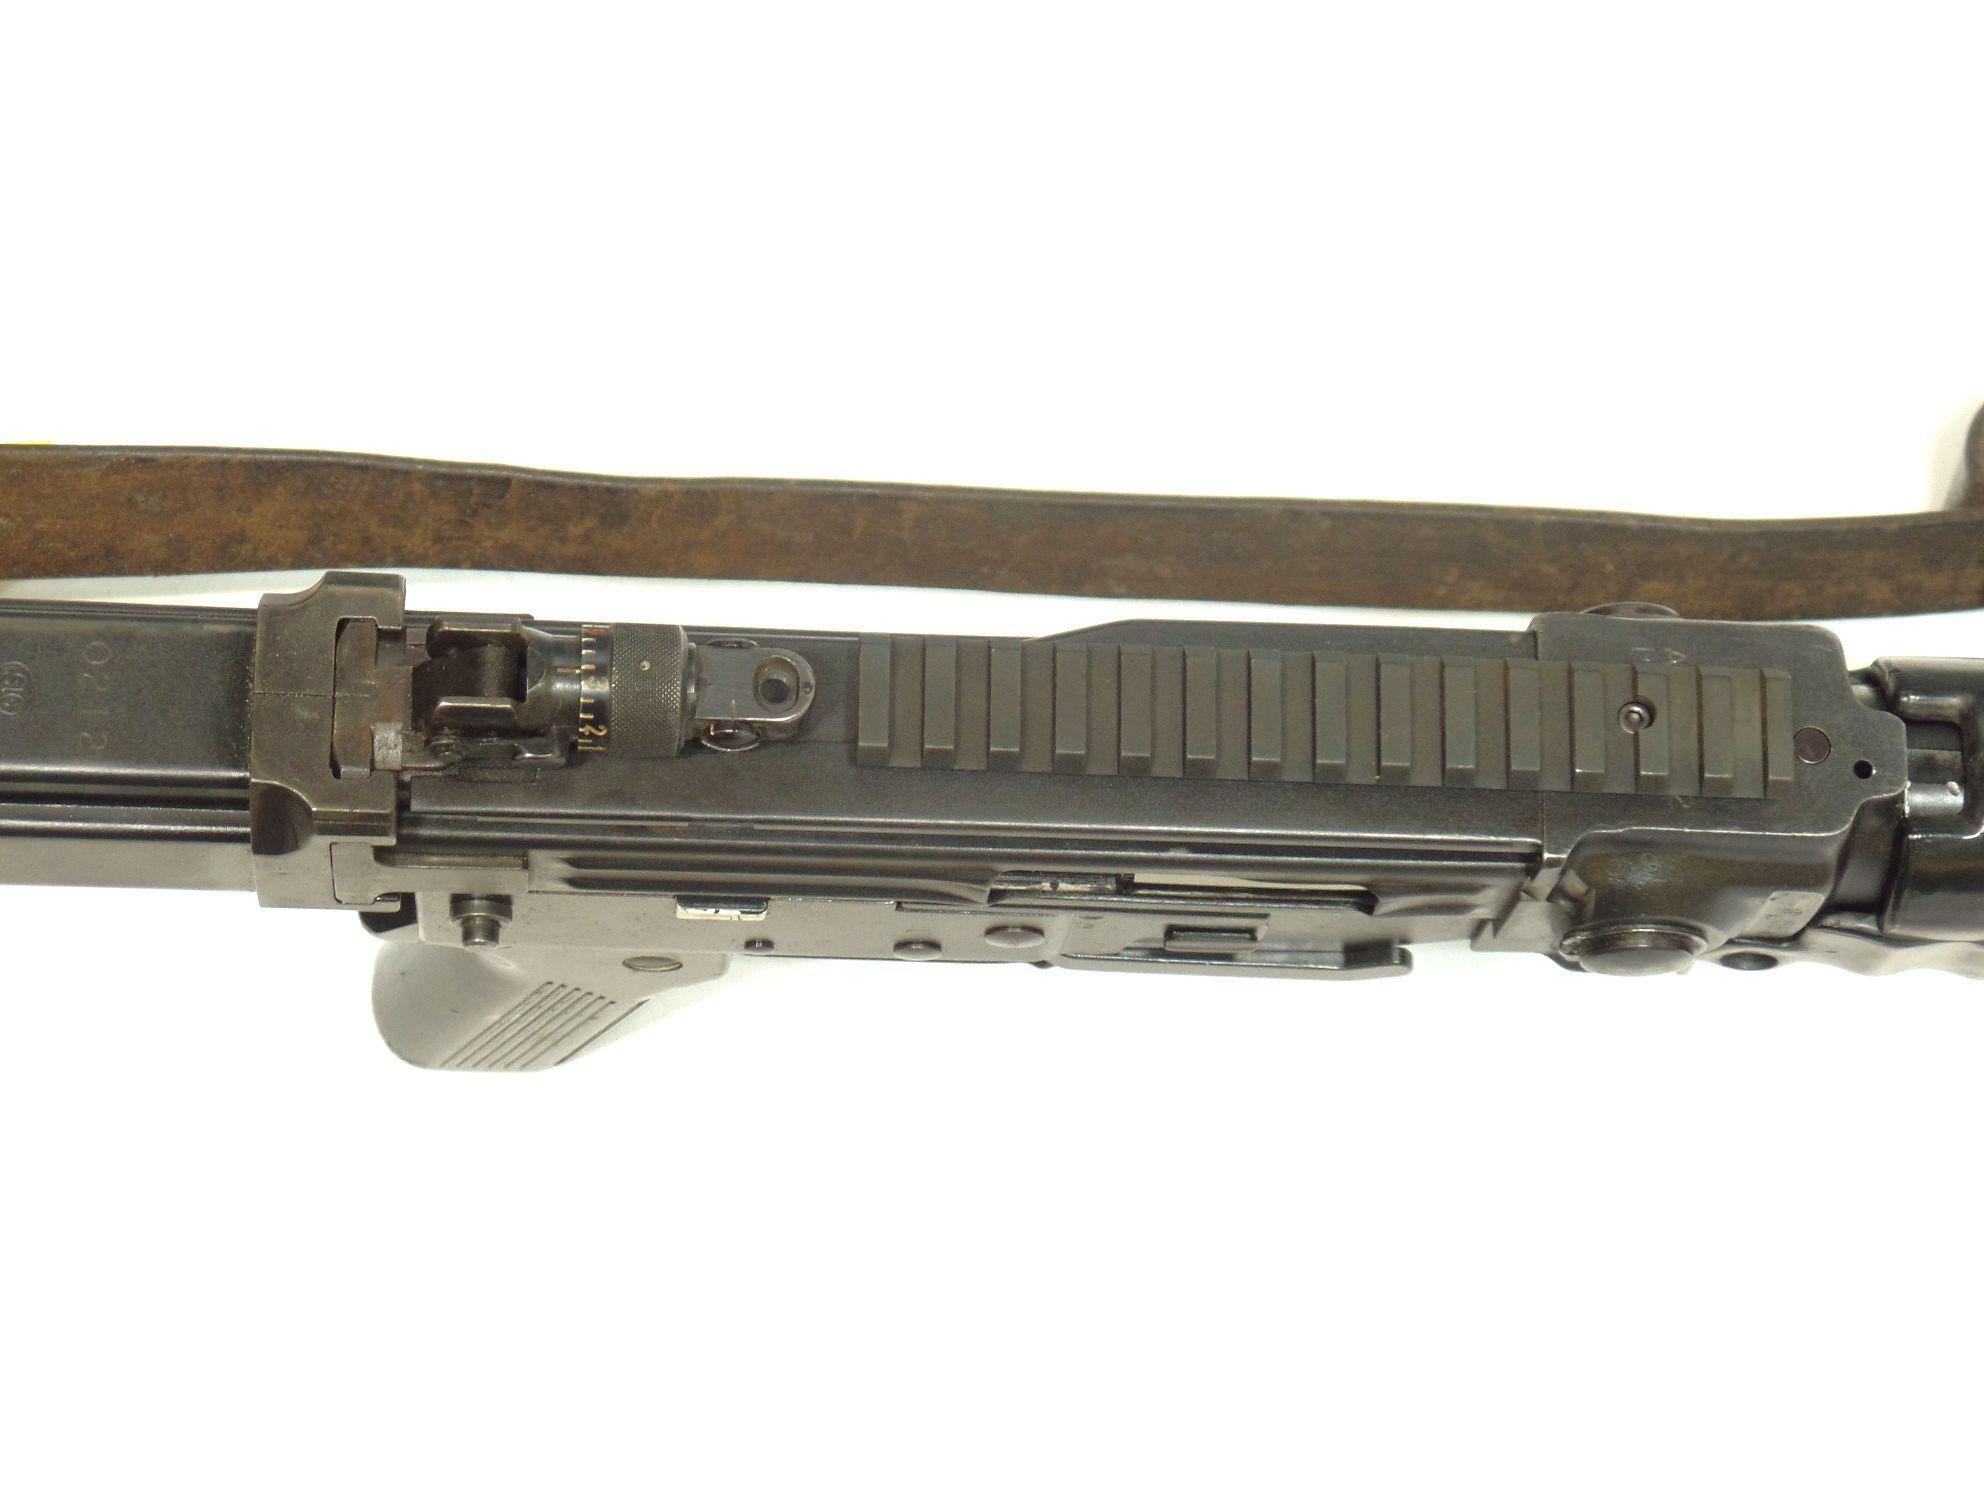 SIG - STG57 calibre 7.5x55